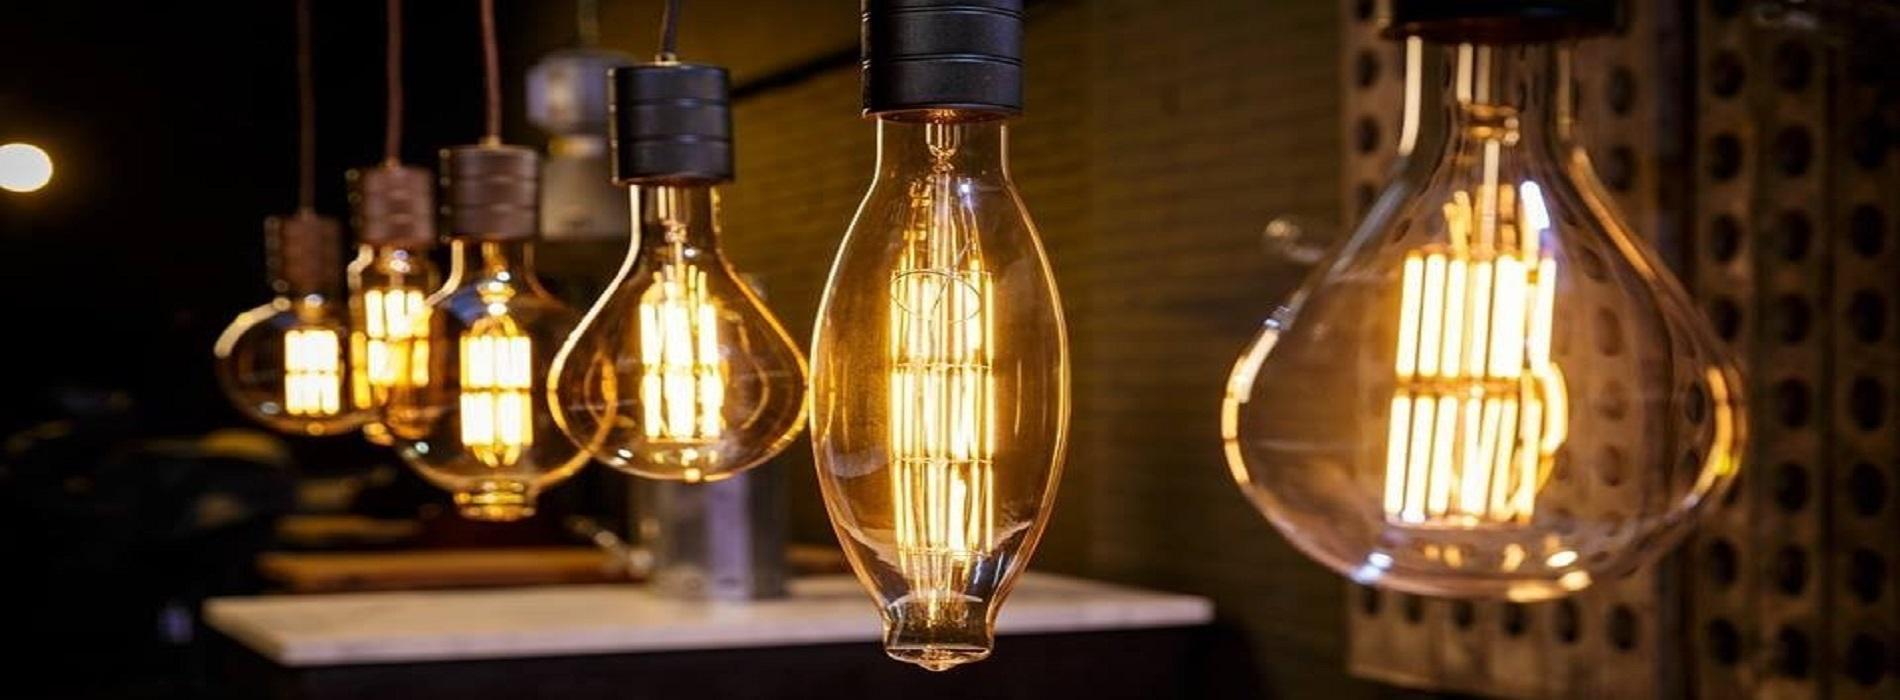 Led Lamp Xxl Sfeerfoto Stat Blok